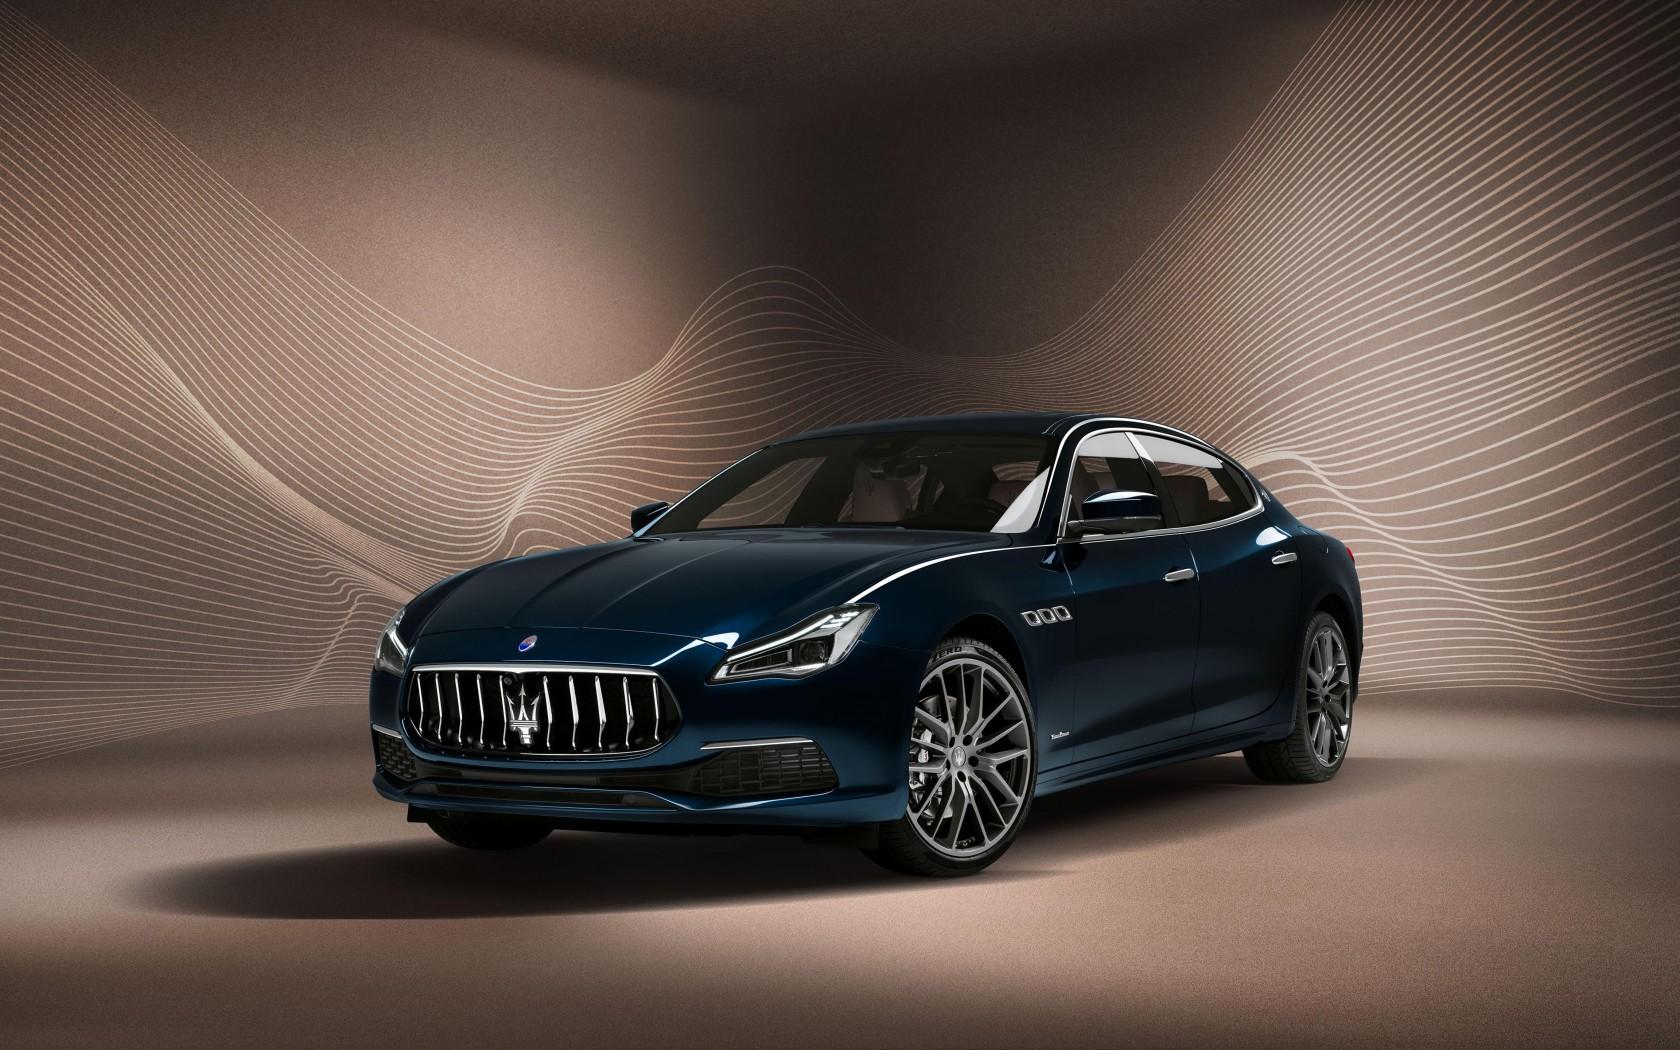 Maserati Quattroporte GranLusso Royale 2020 5K HD desktop 1680x1050